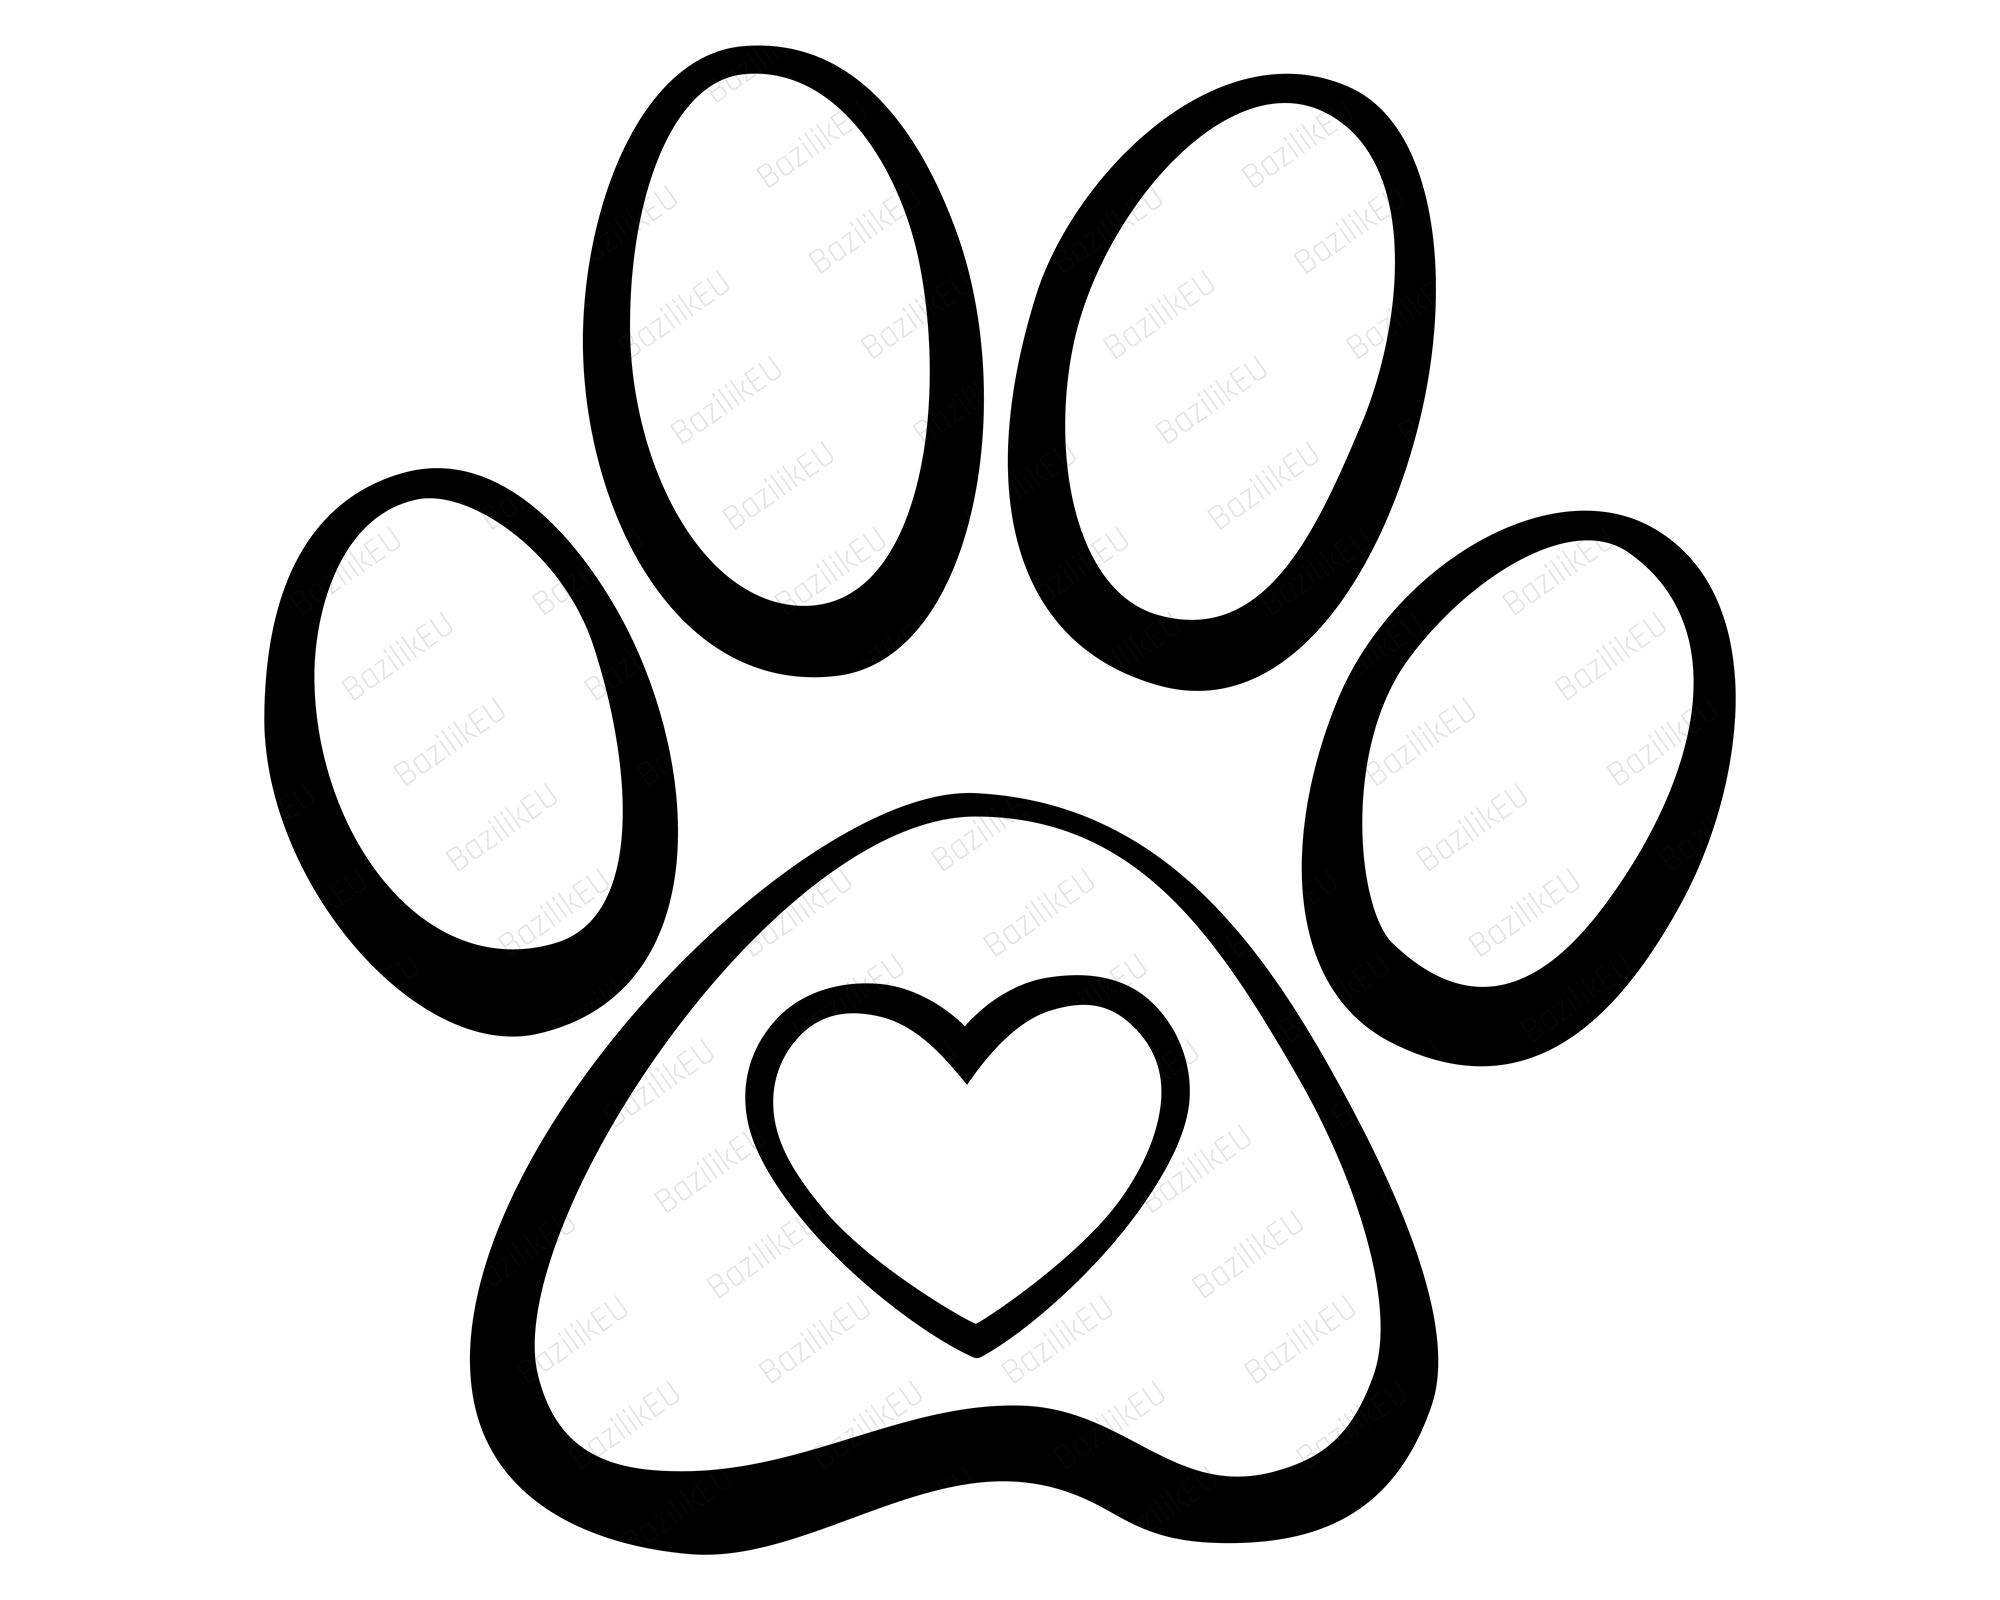 Download Heart Paw Print SVG, Dog Paws, Pet Paw Print SVG, Dog Love ...